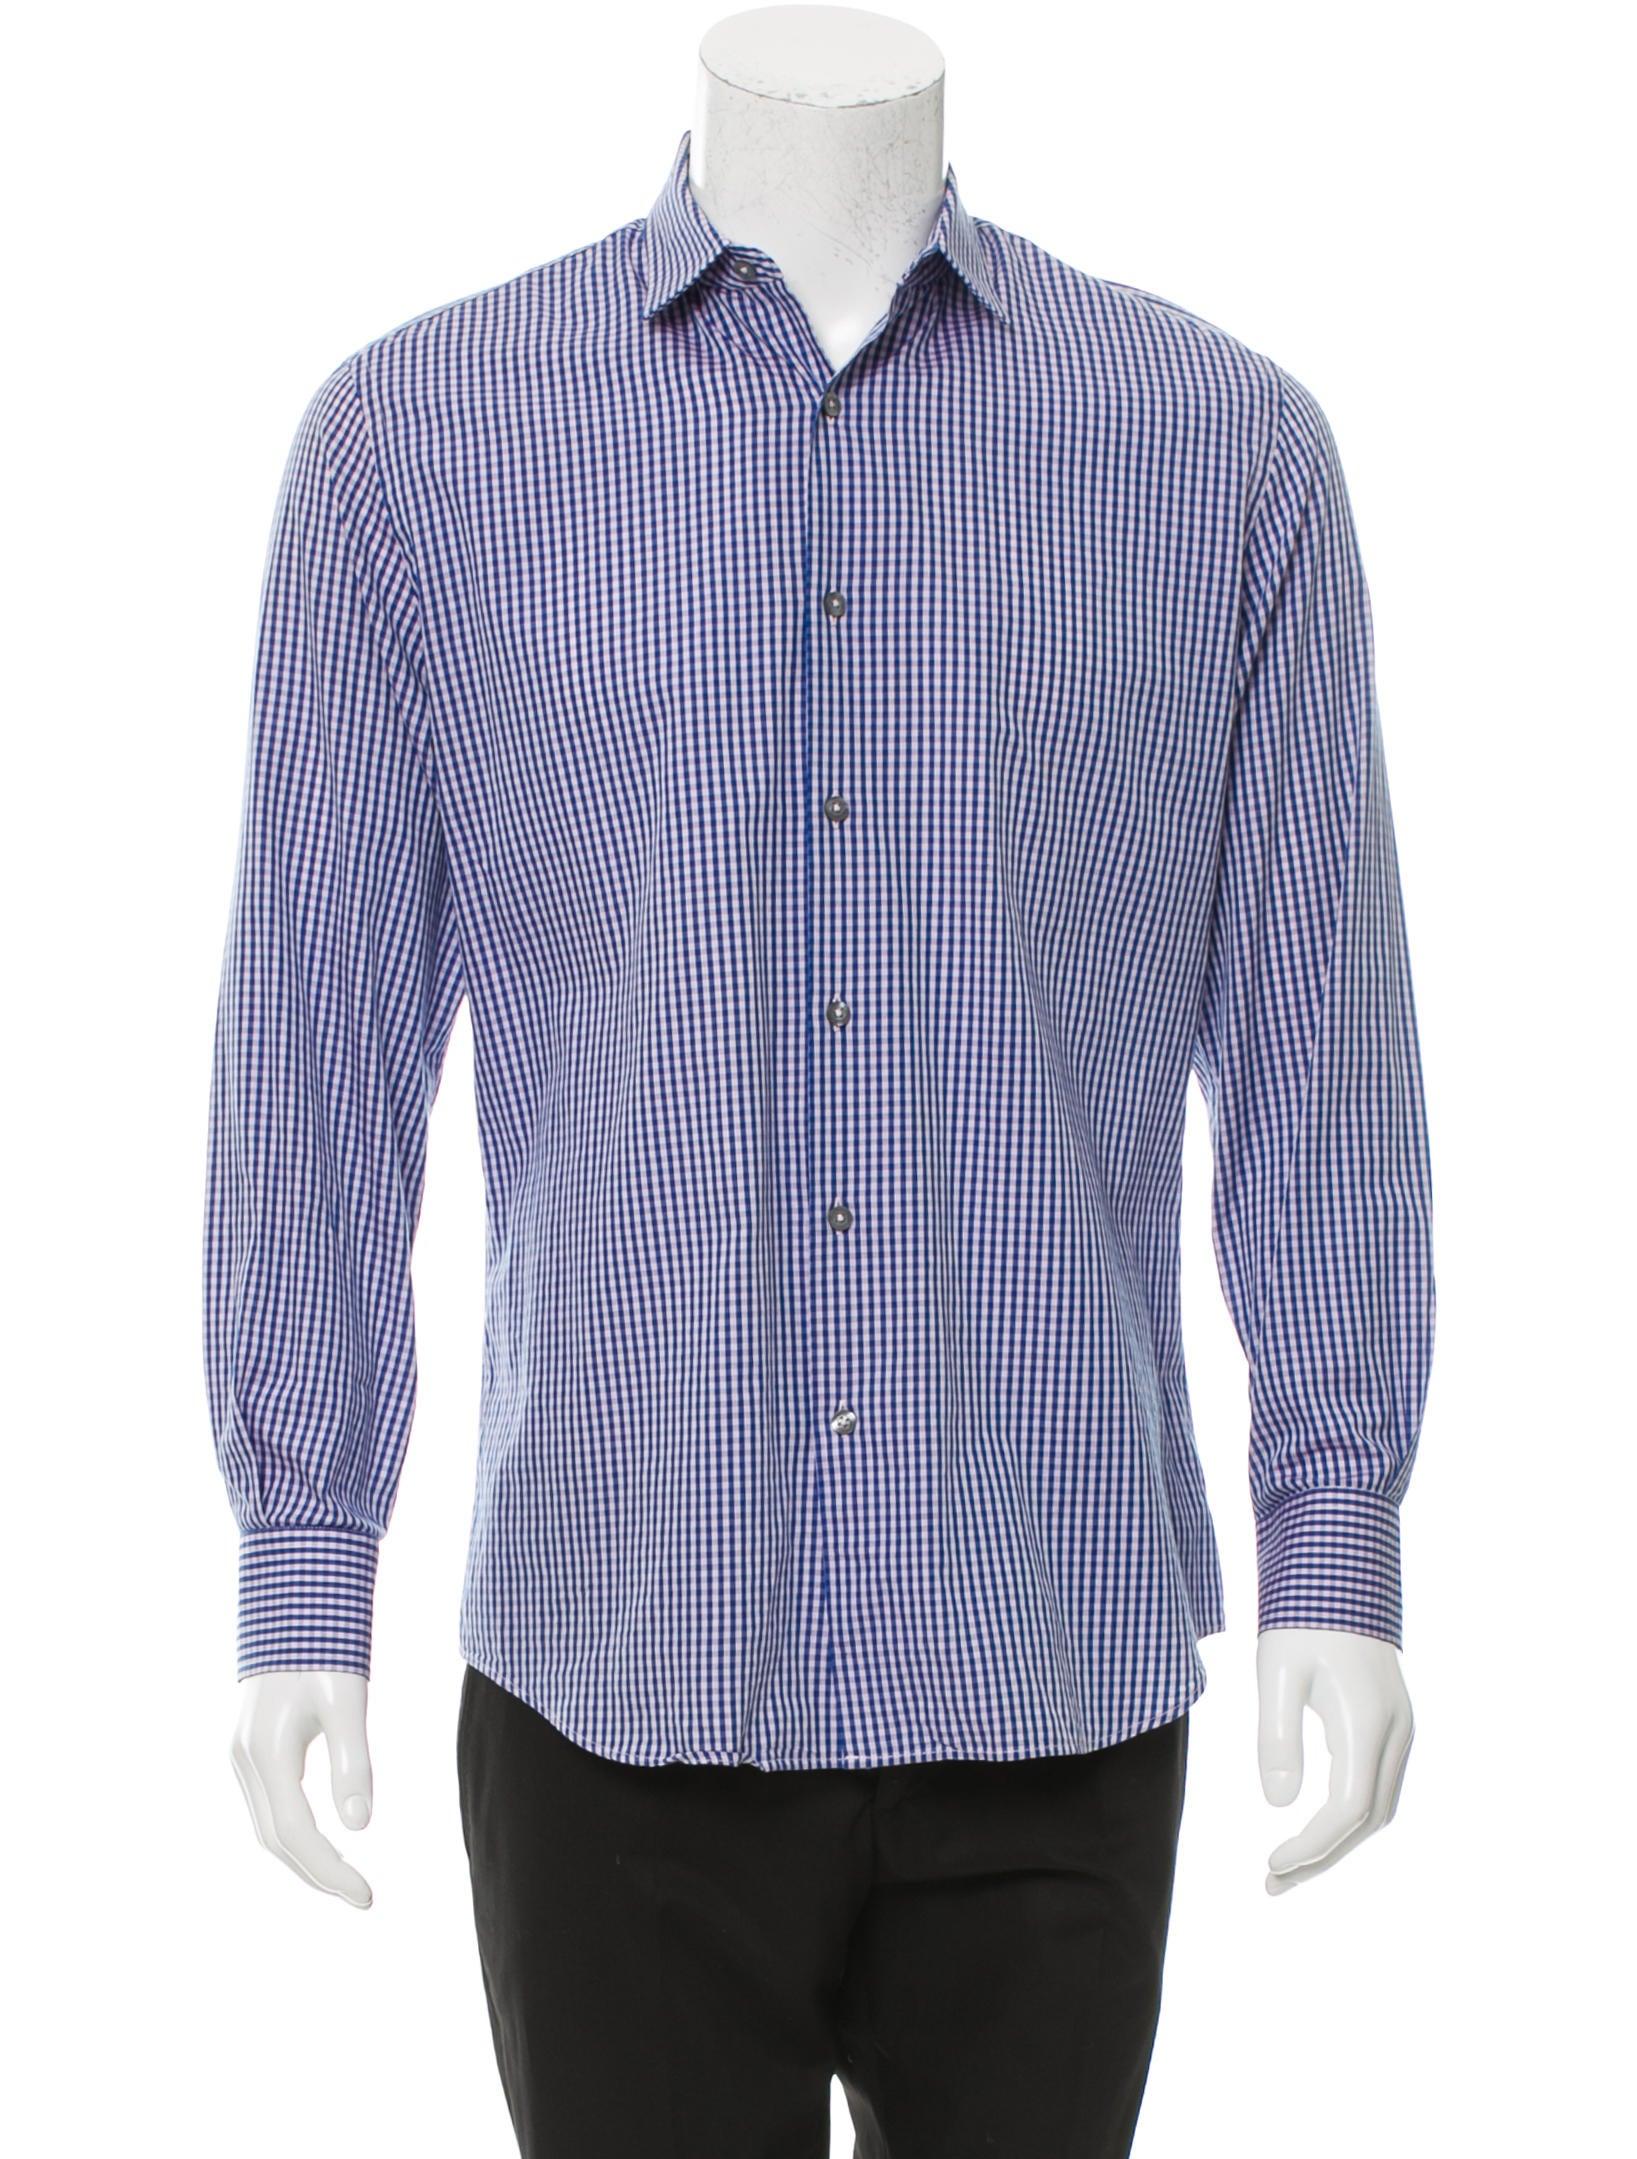 Paul smith slim fit check print shirt clothing for Slim fit check shirt